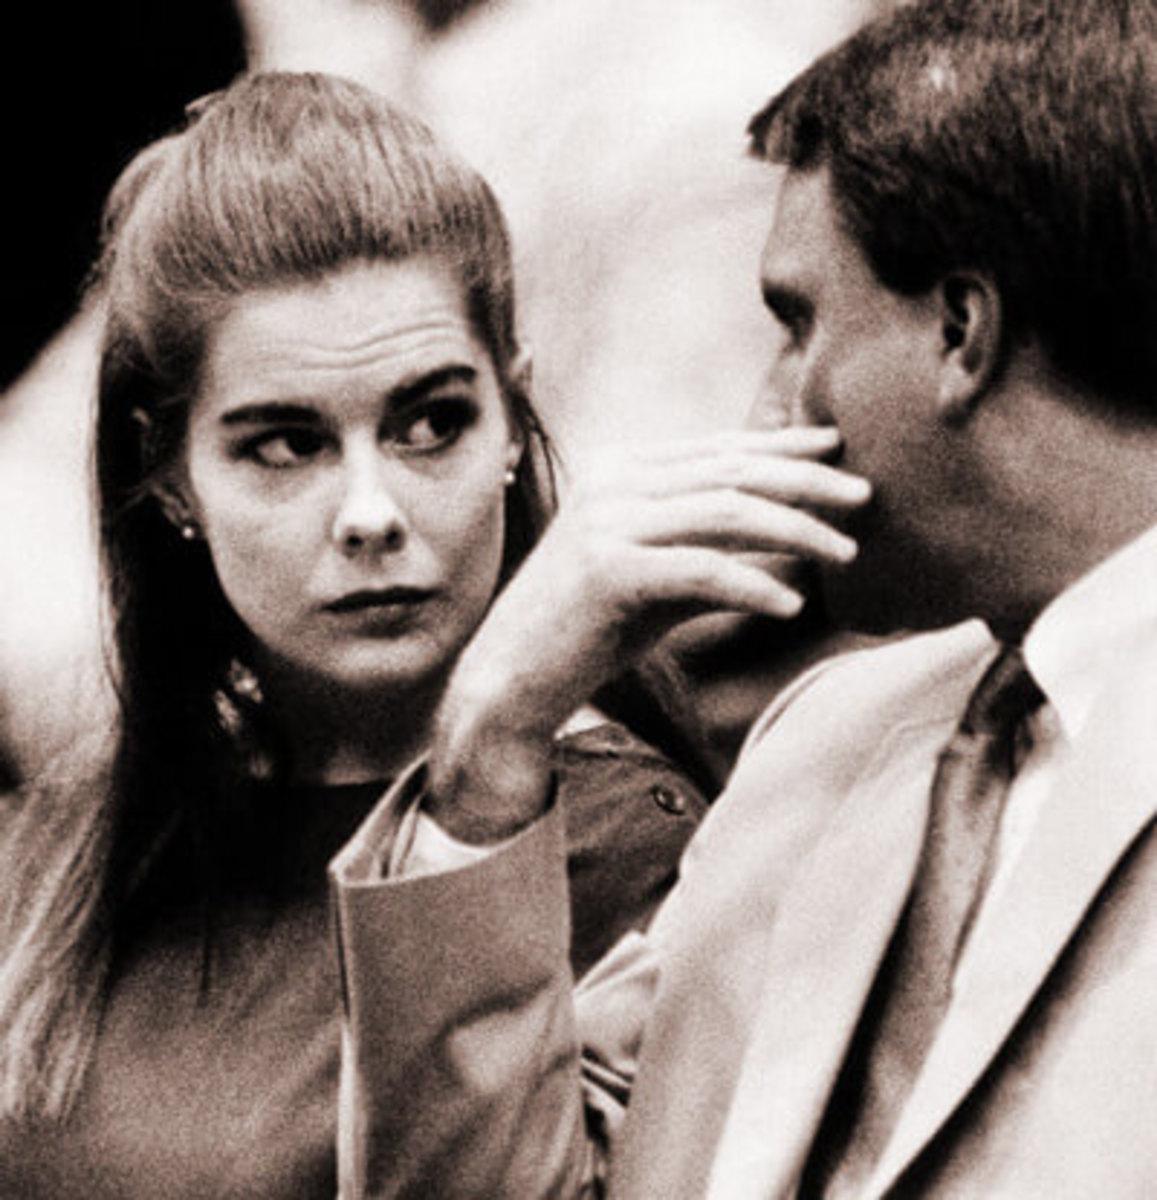 Elizabeth Haysom conferring with her attorney